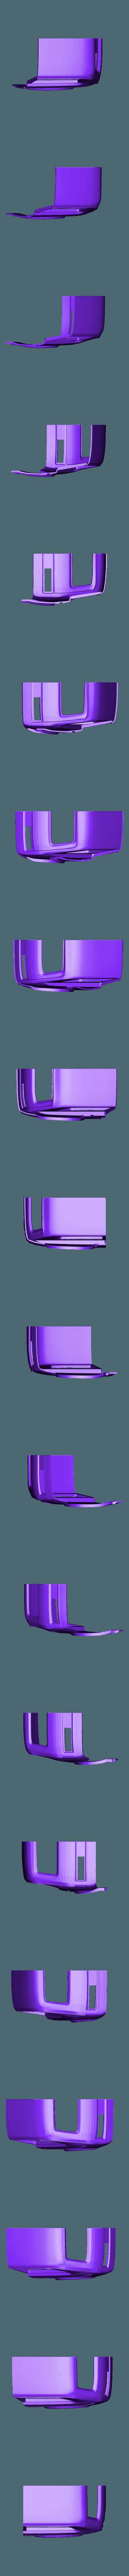 Lada_Niva (6).stl Download STL file Lada Niva  • 3D printing template, serega1337